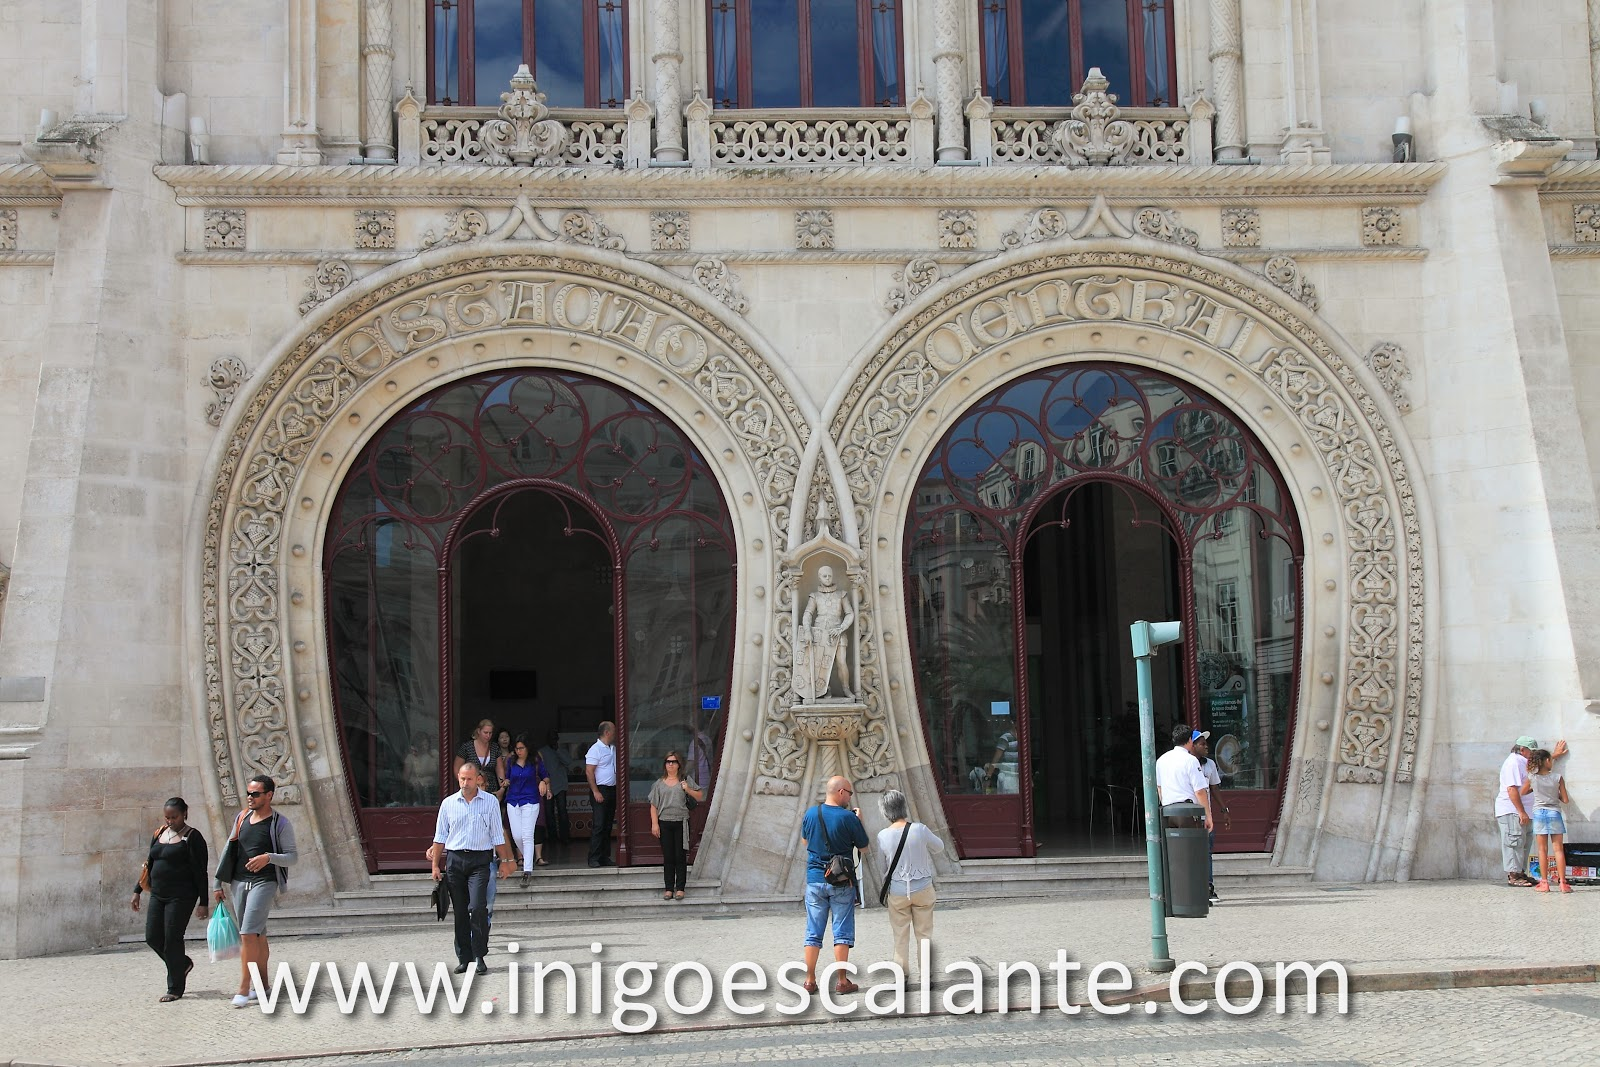 Blog sobre fotograf a y viajes del fot grafo i igo for Oficina de turismo lisboa